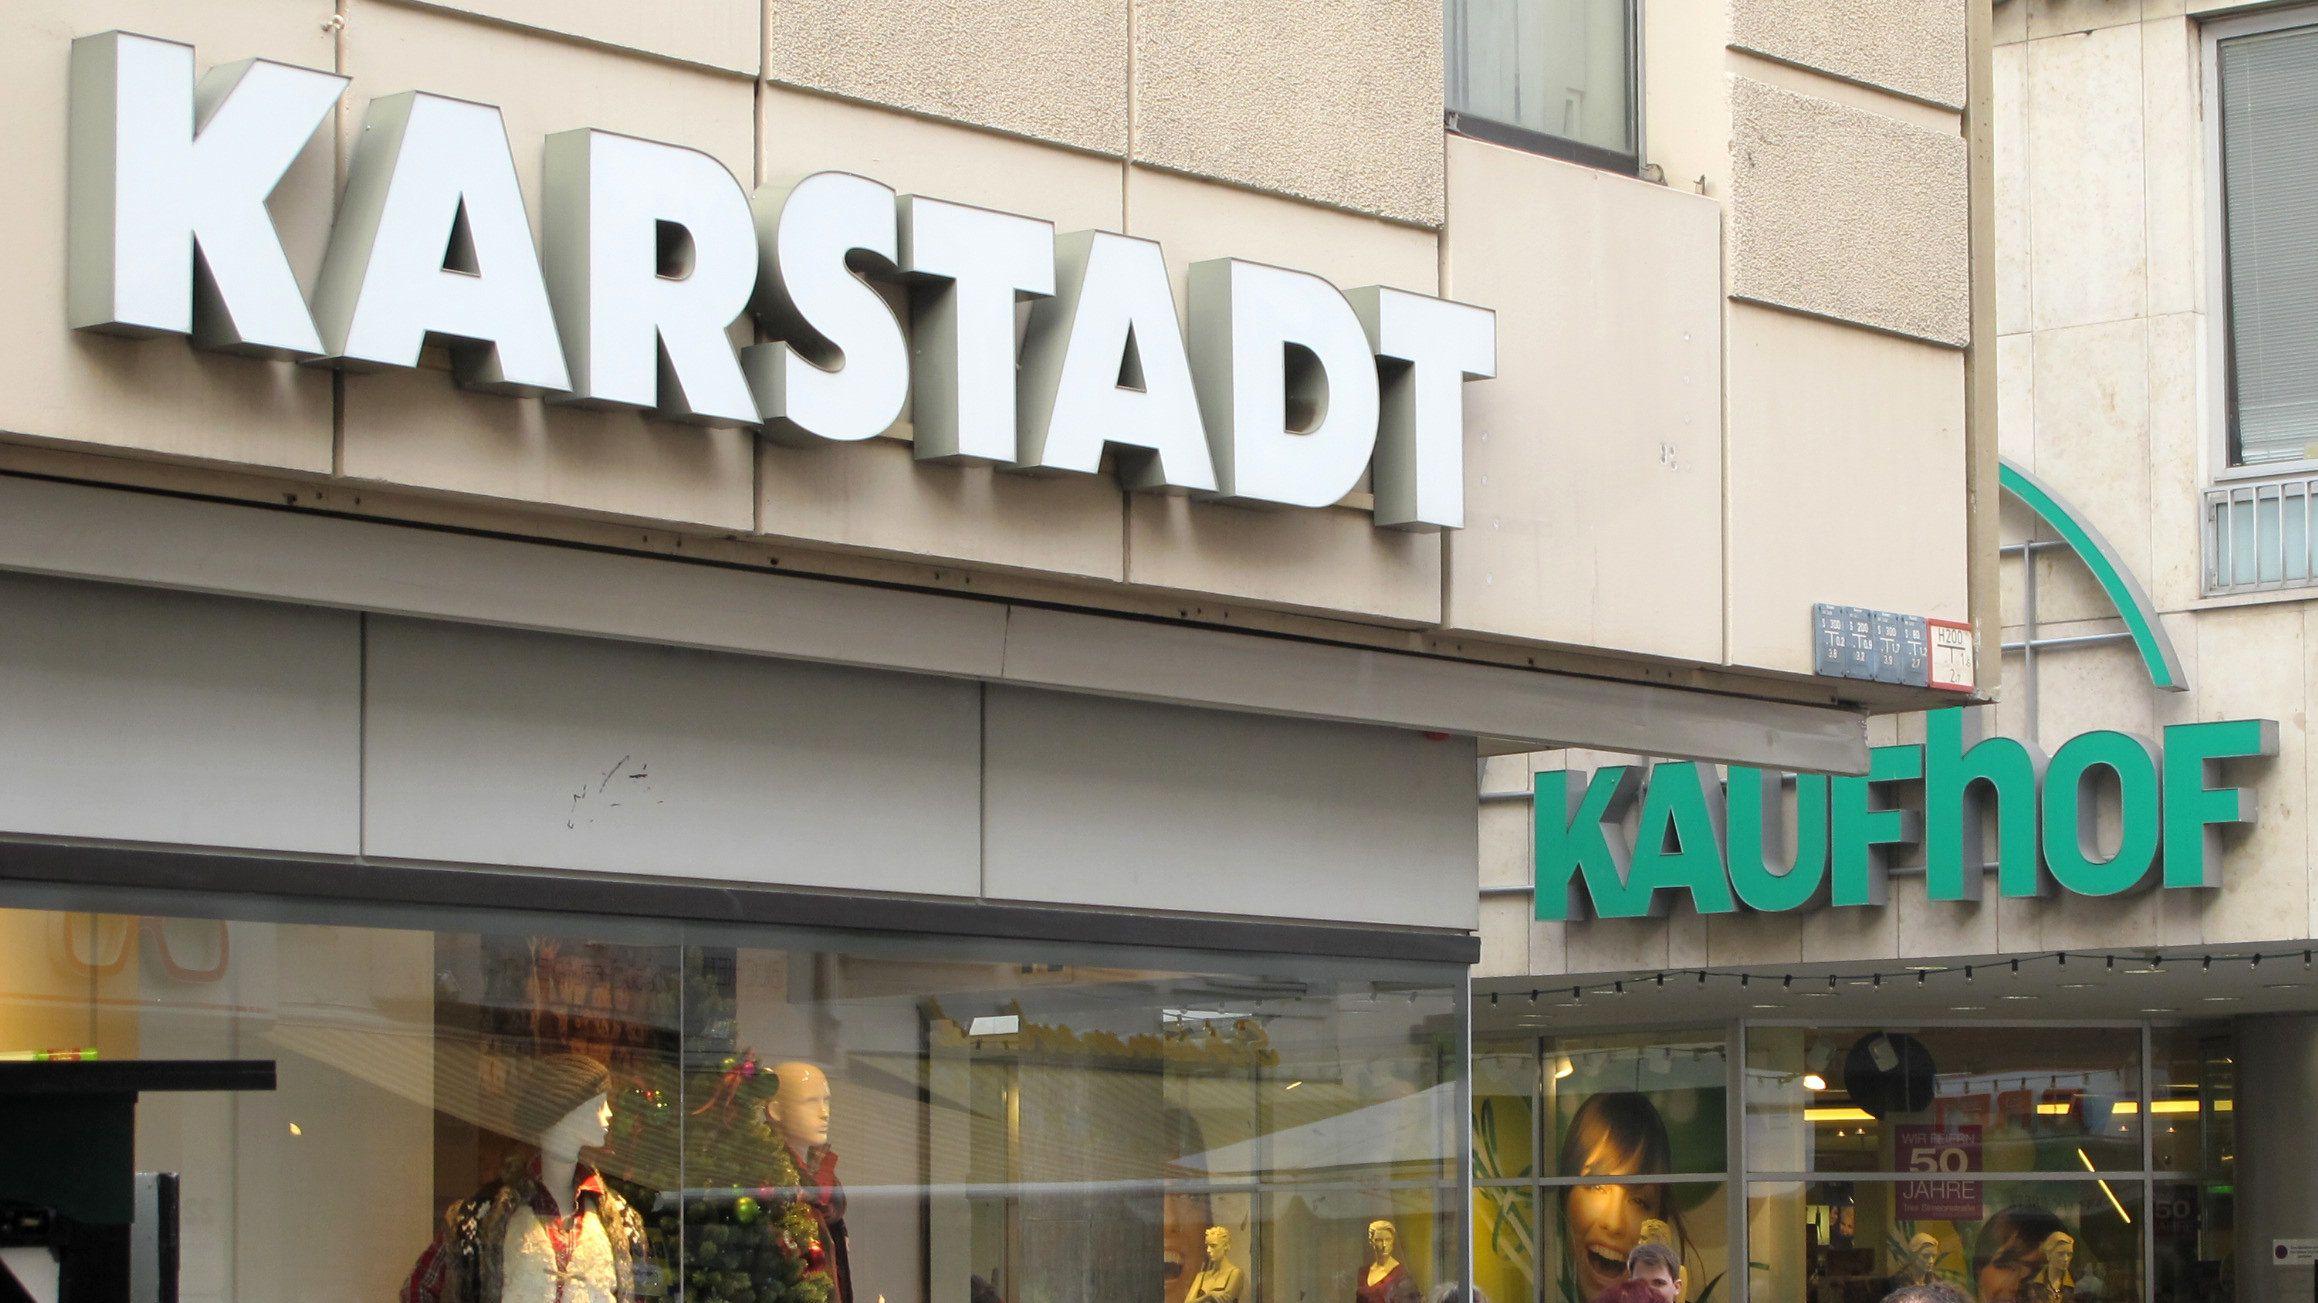 Karstadt übernimmt Reisebüros von Thomas Cook